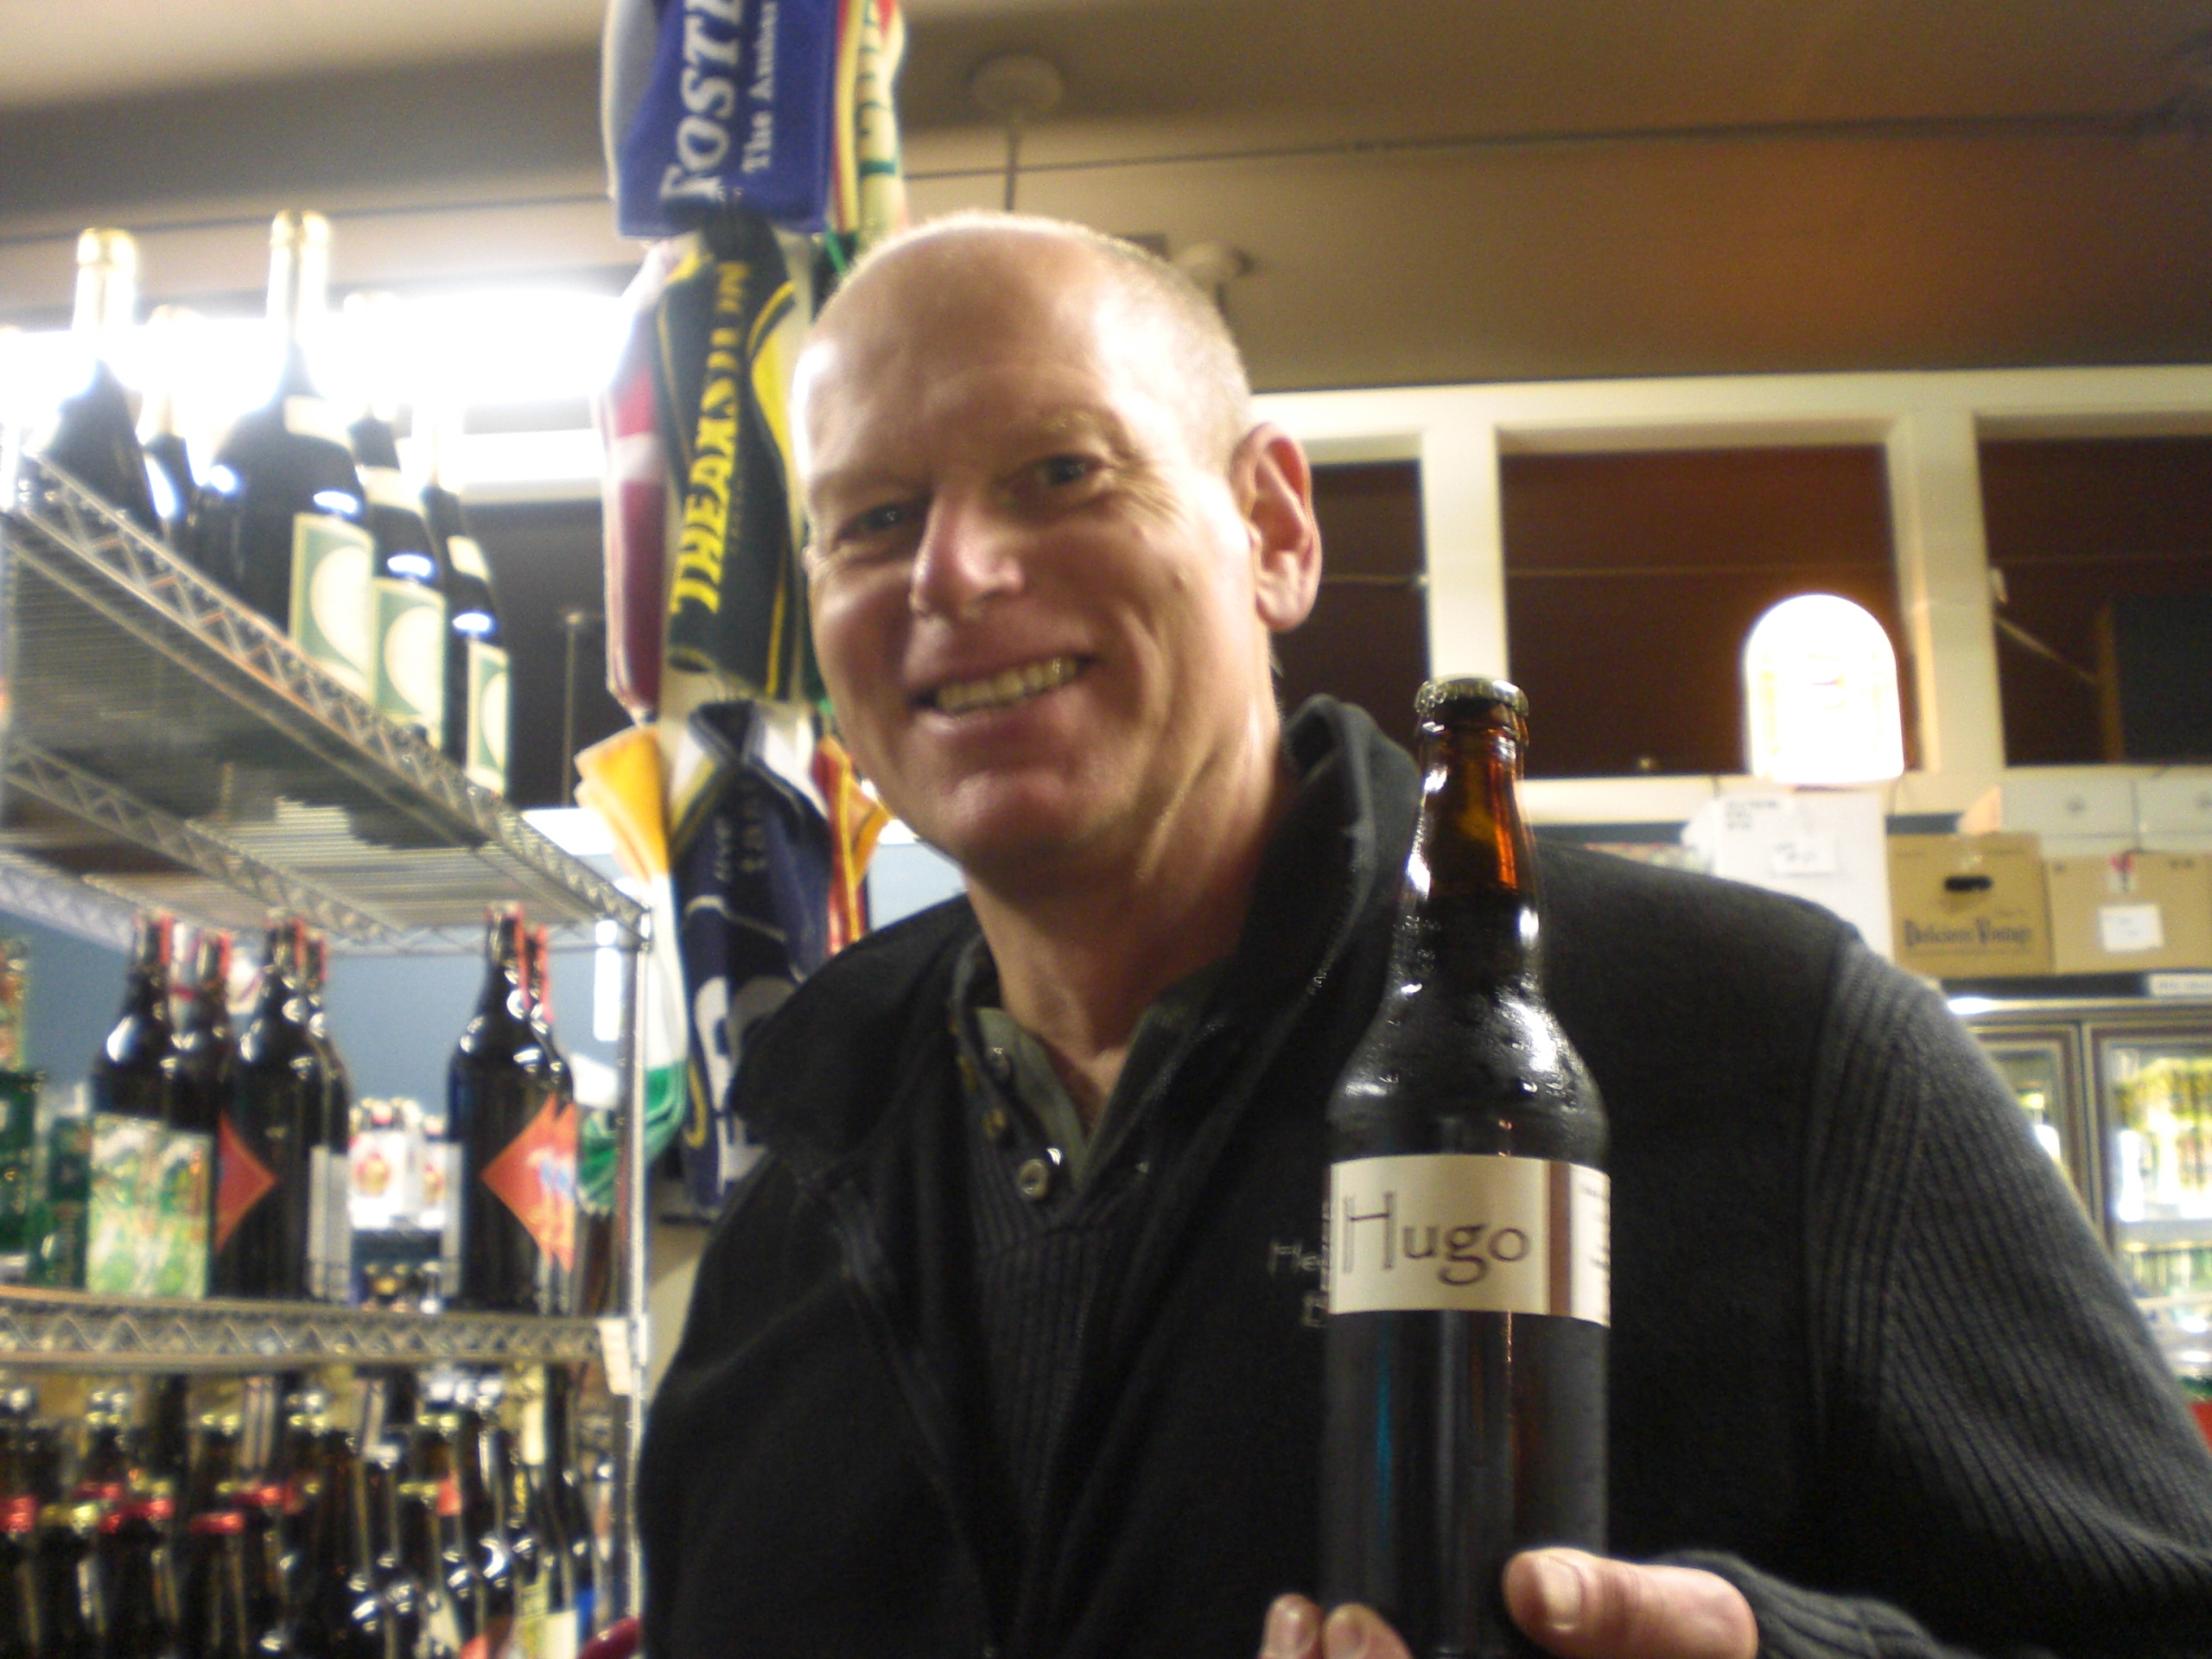 Heater Allen's Rick Allen will feature his tasty German-inspired brew at Belmont Station's Fringe Fest